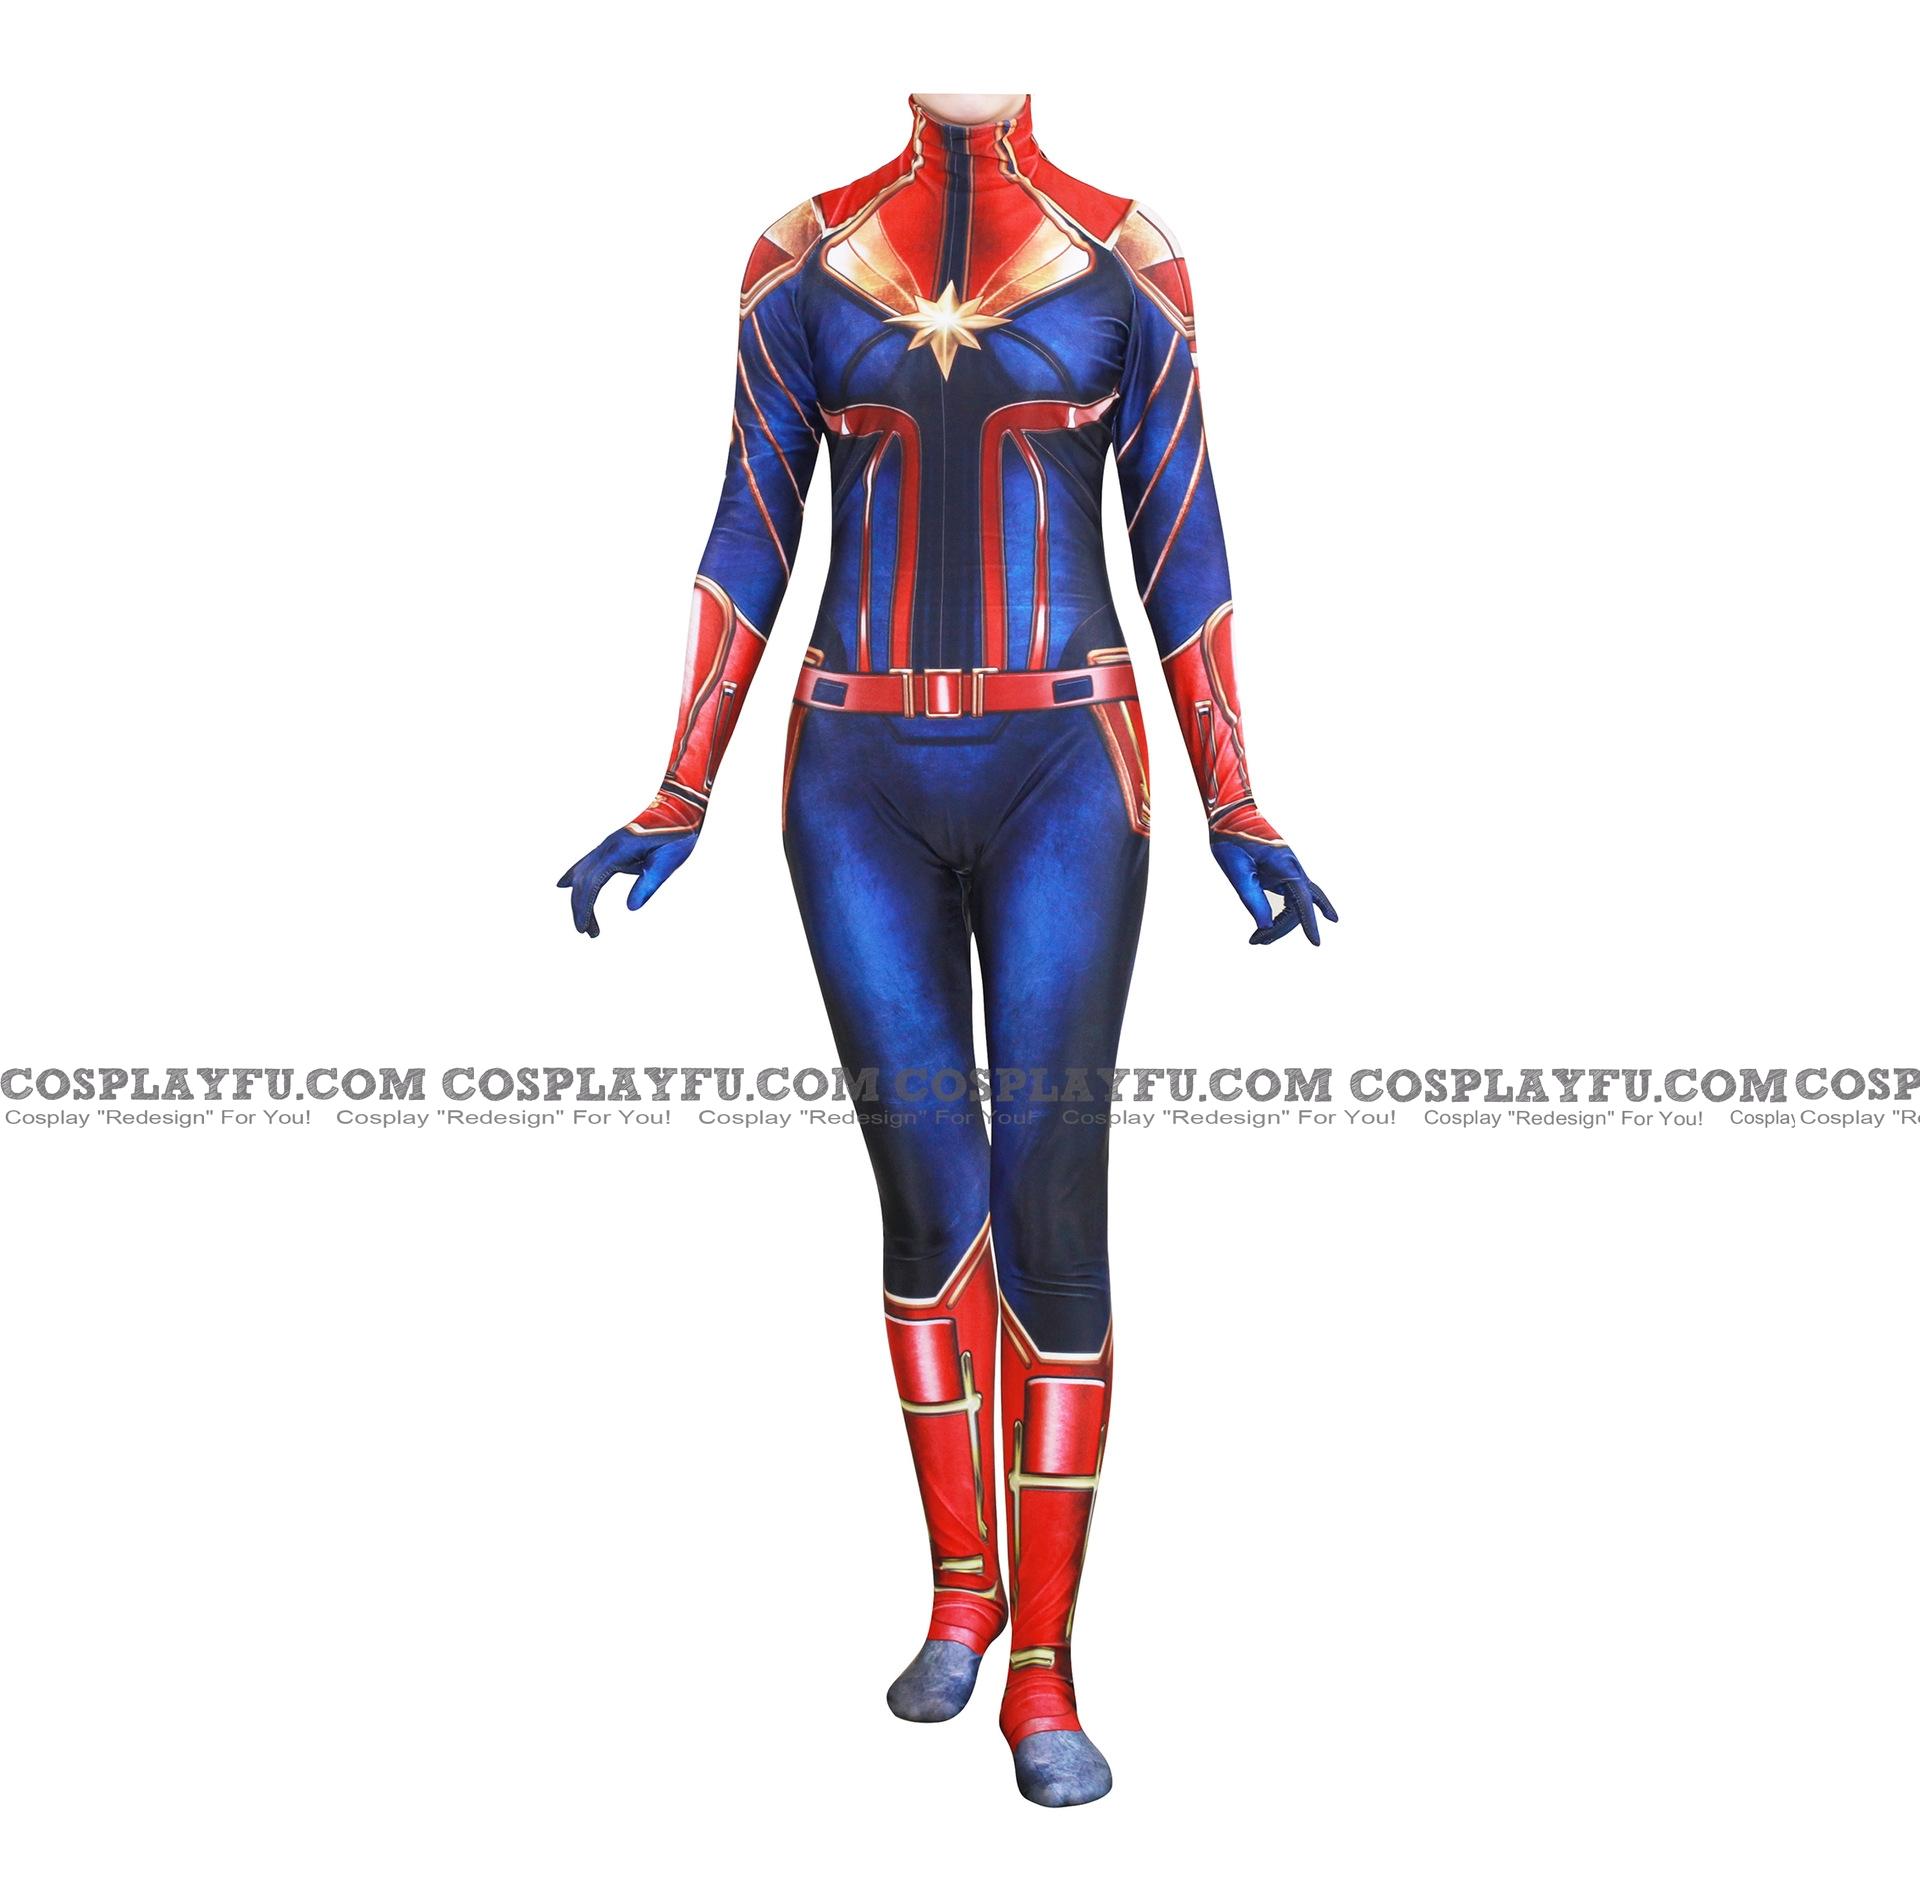 Captain America Ms. Marvel Costume (Infinity War)